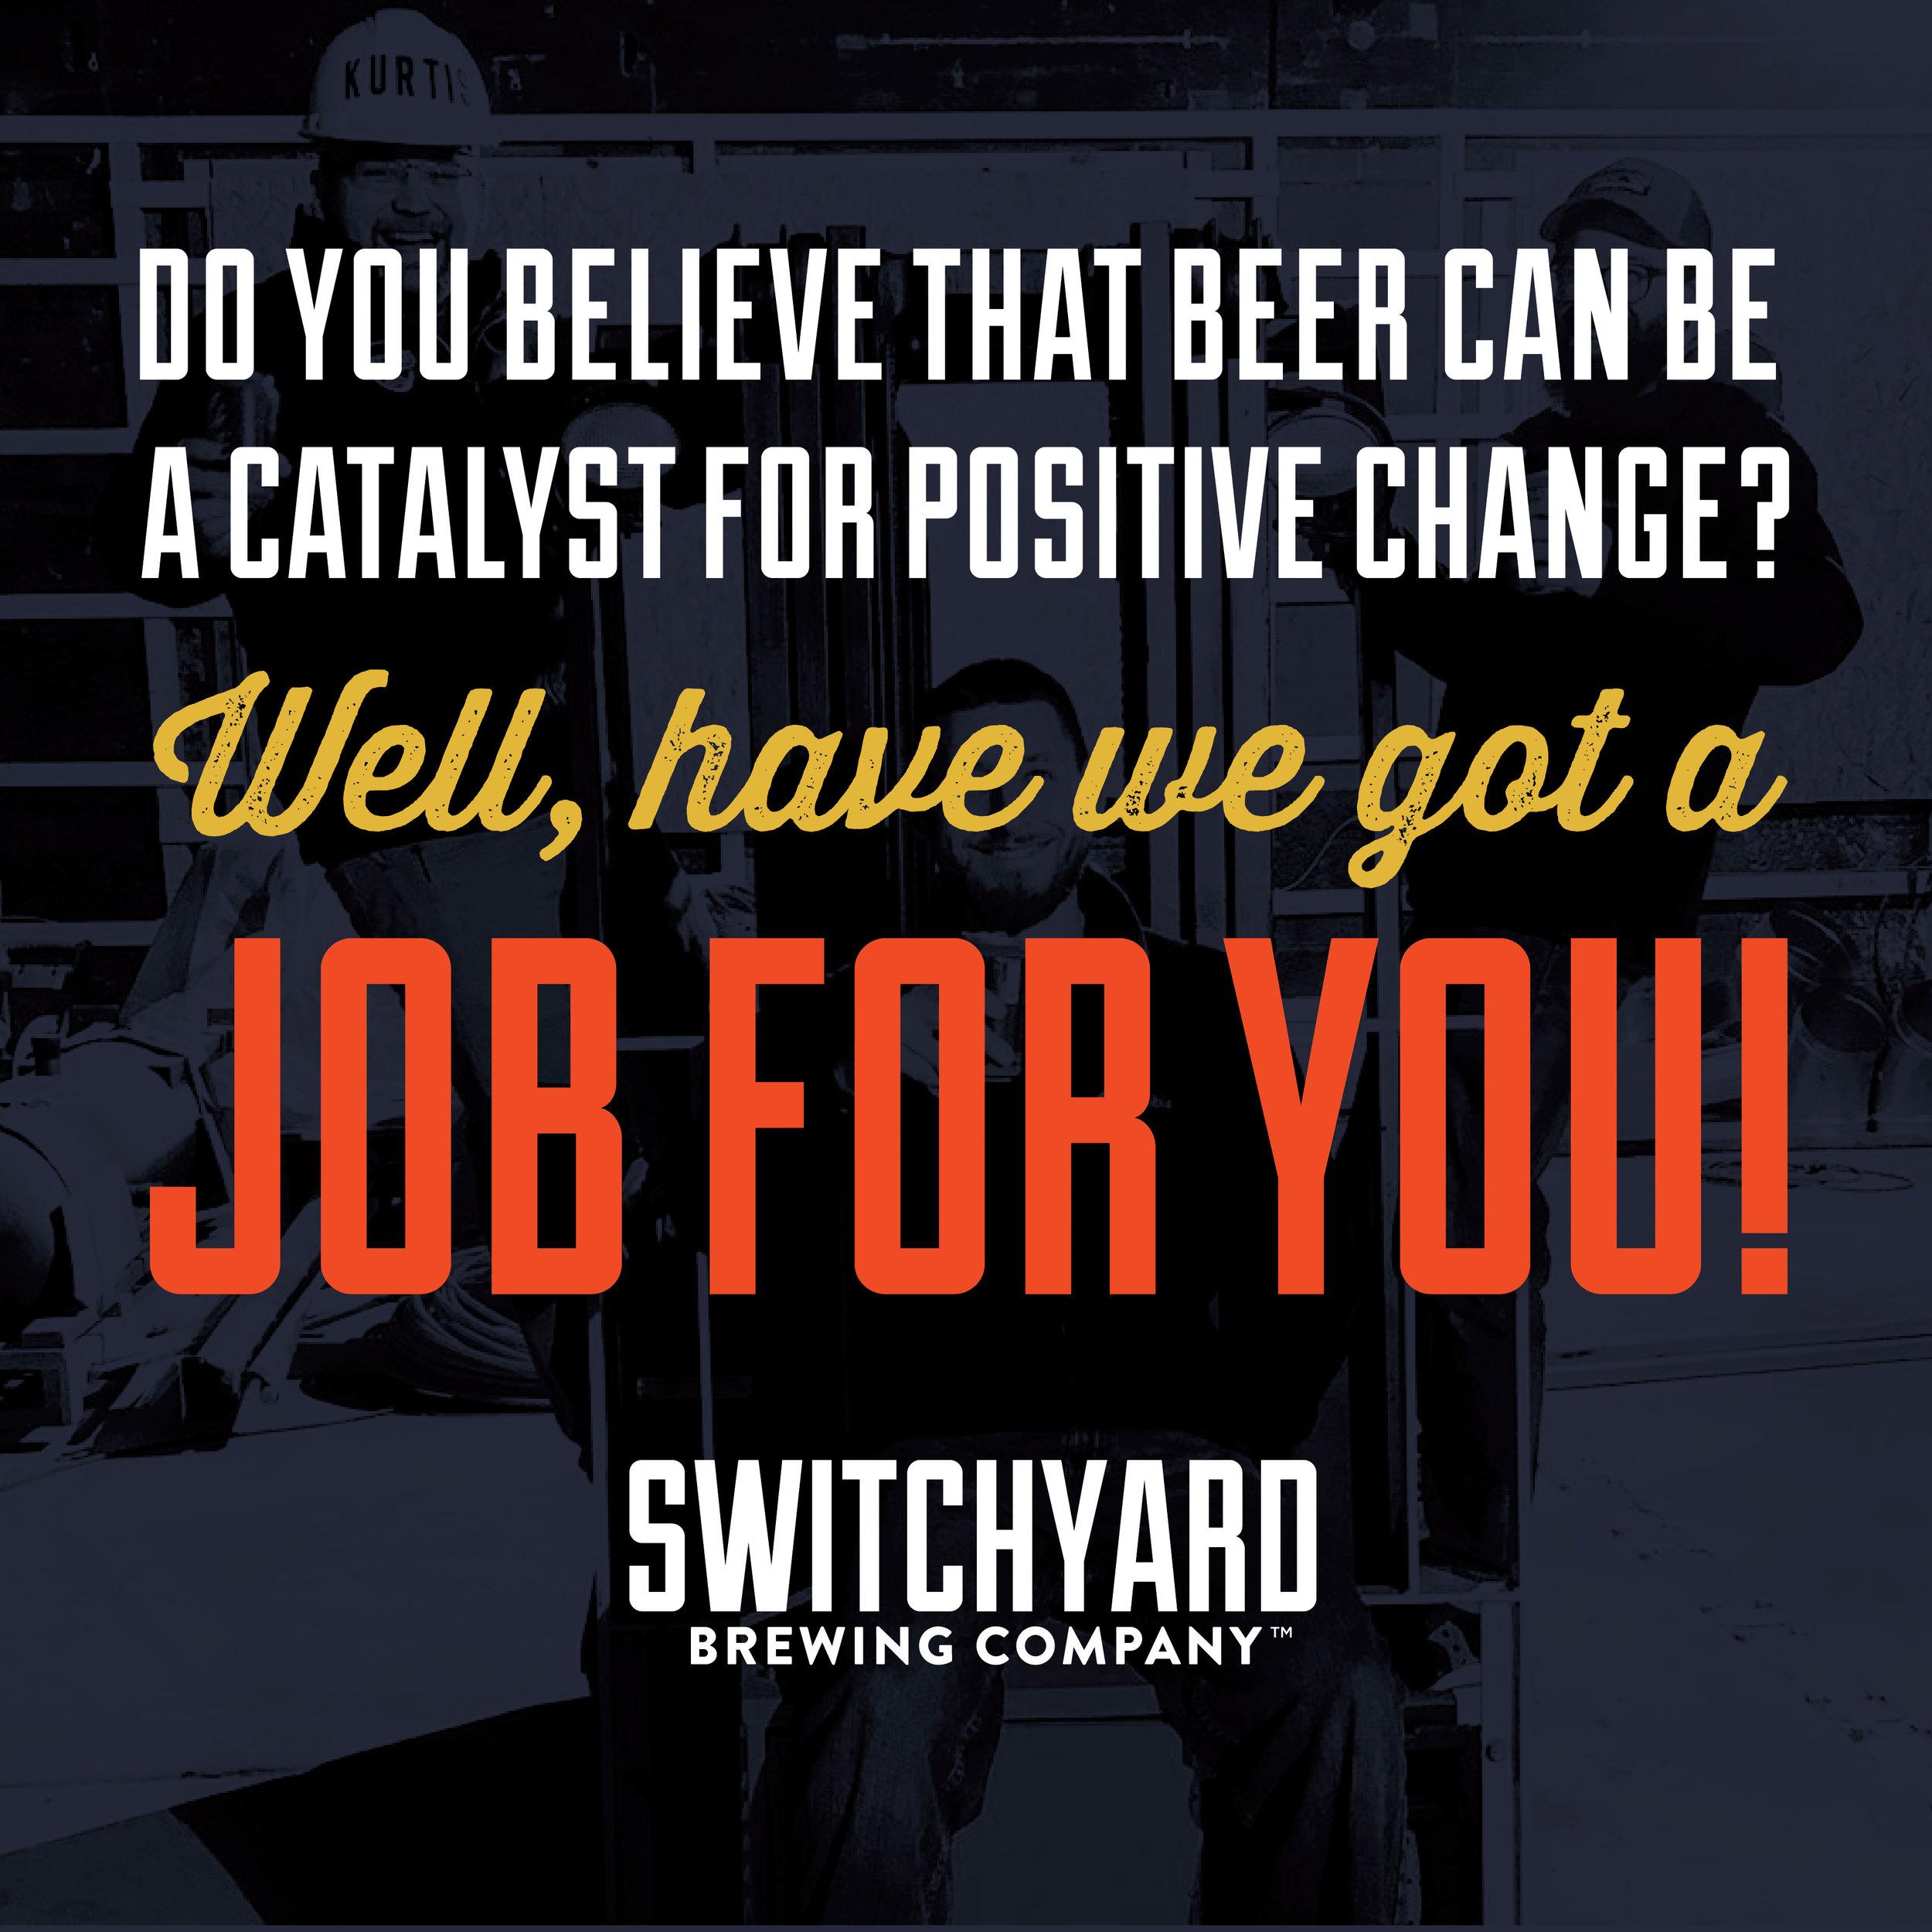 Switchyard_JobFairGraphic-01 (1).jpg